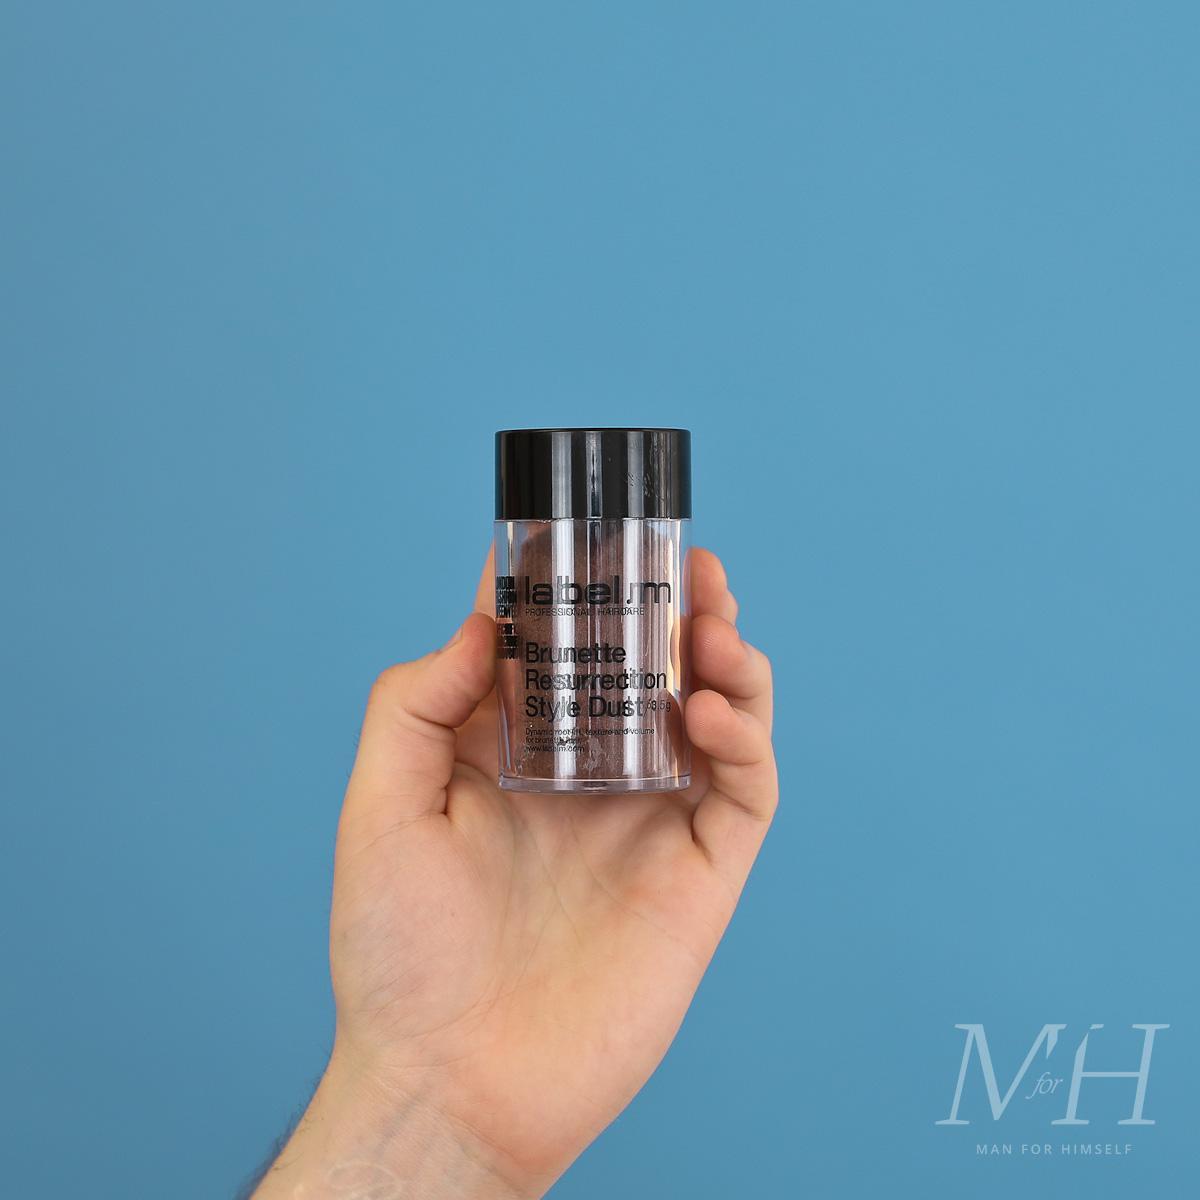 label-men-brunette-resurrection-powder-product-review-man-for-himself